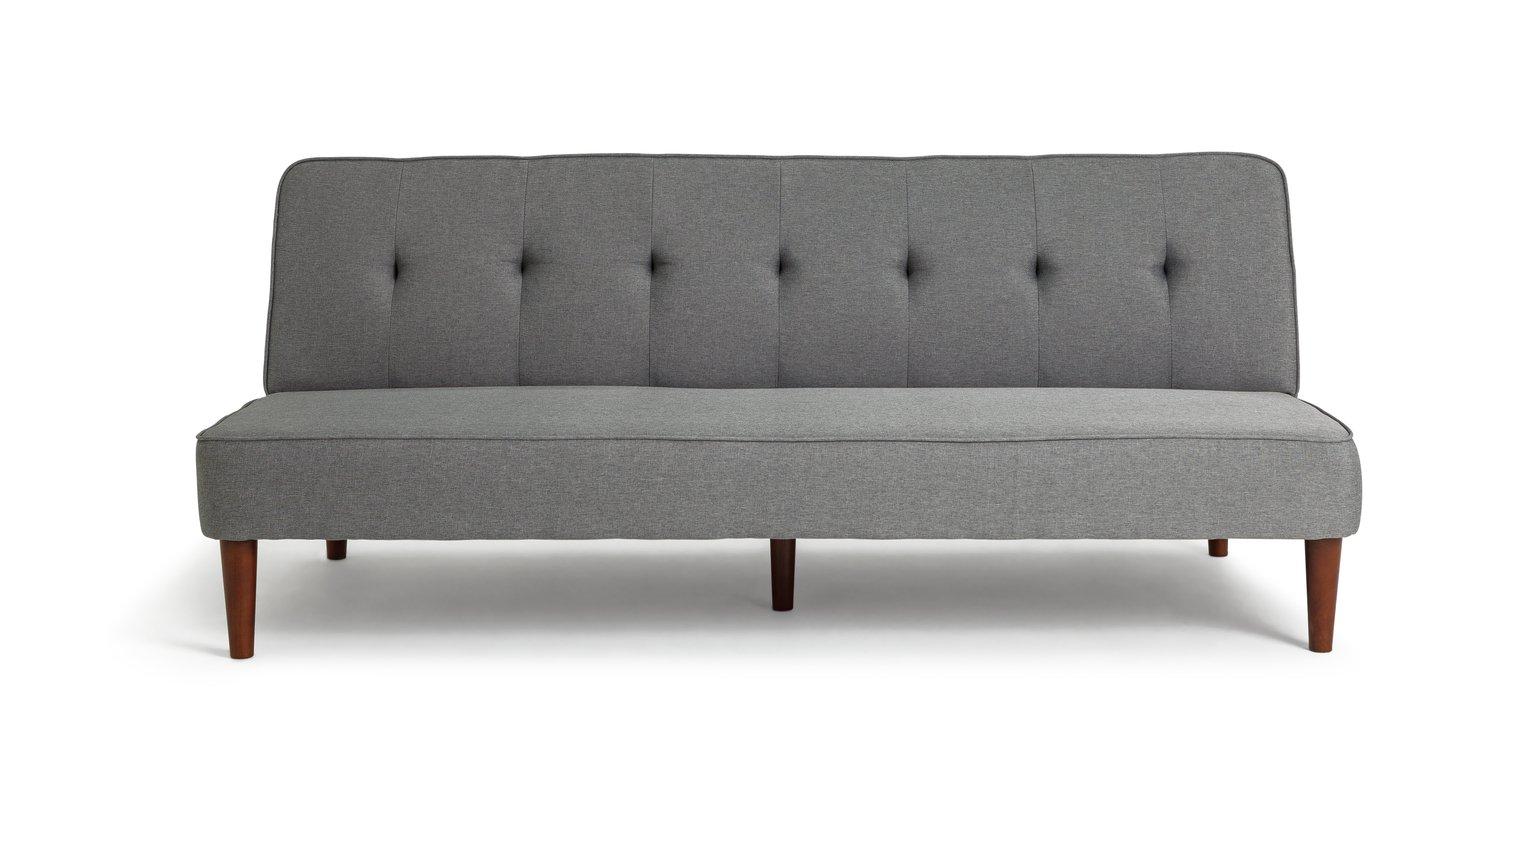 Habitat Odeon 2 Seater Fabric Sofa Bed - Grey